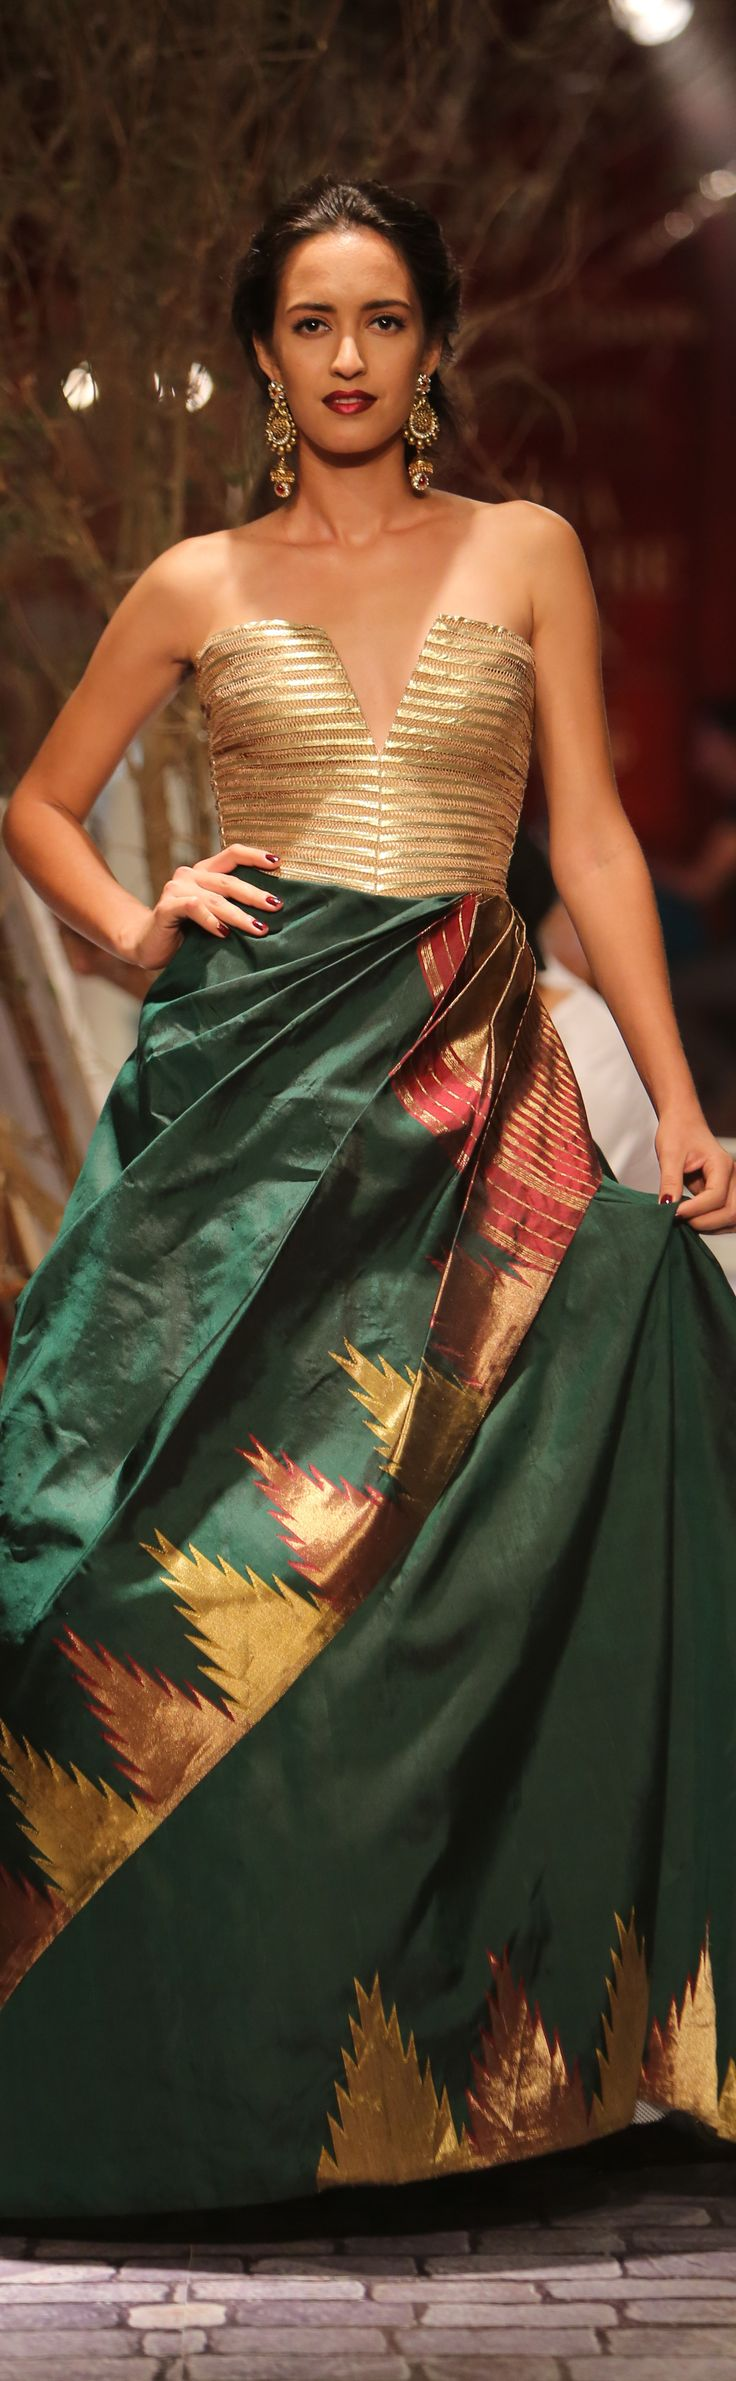 Monisha Jaising Collection at India Couture Week - original pin by @webjournal